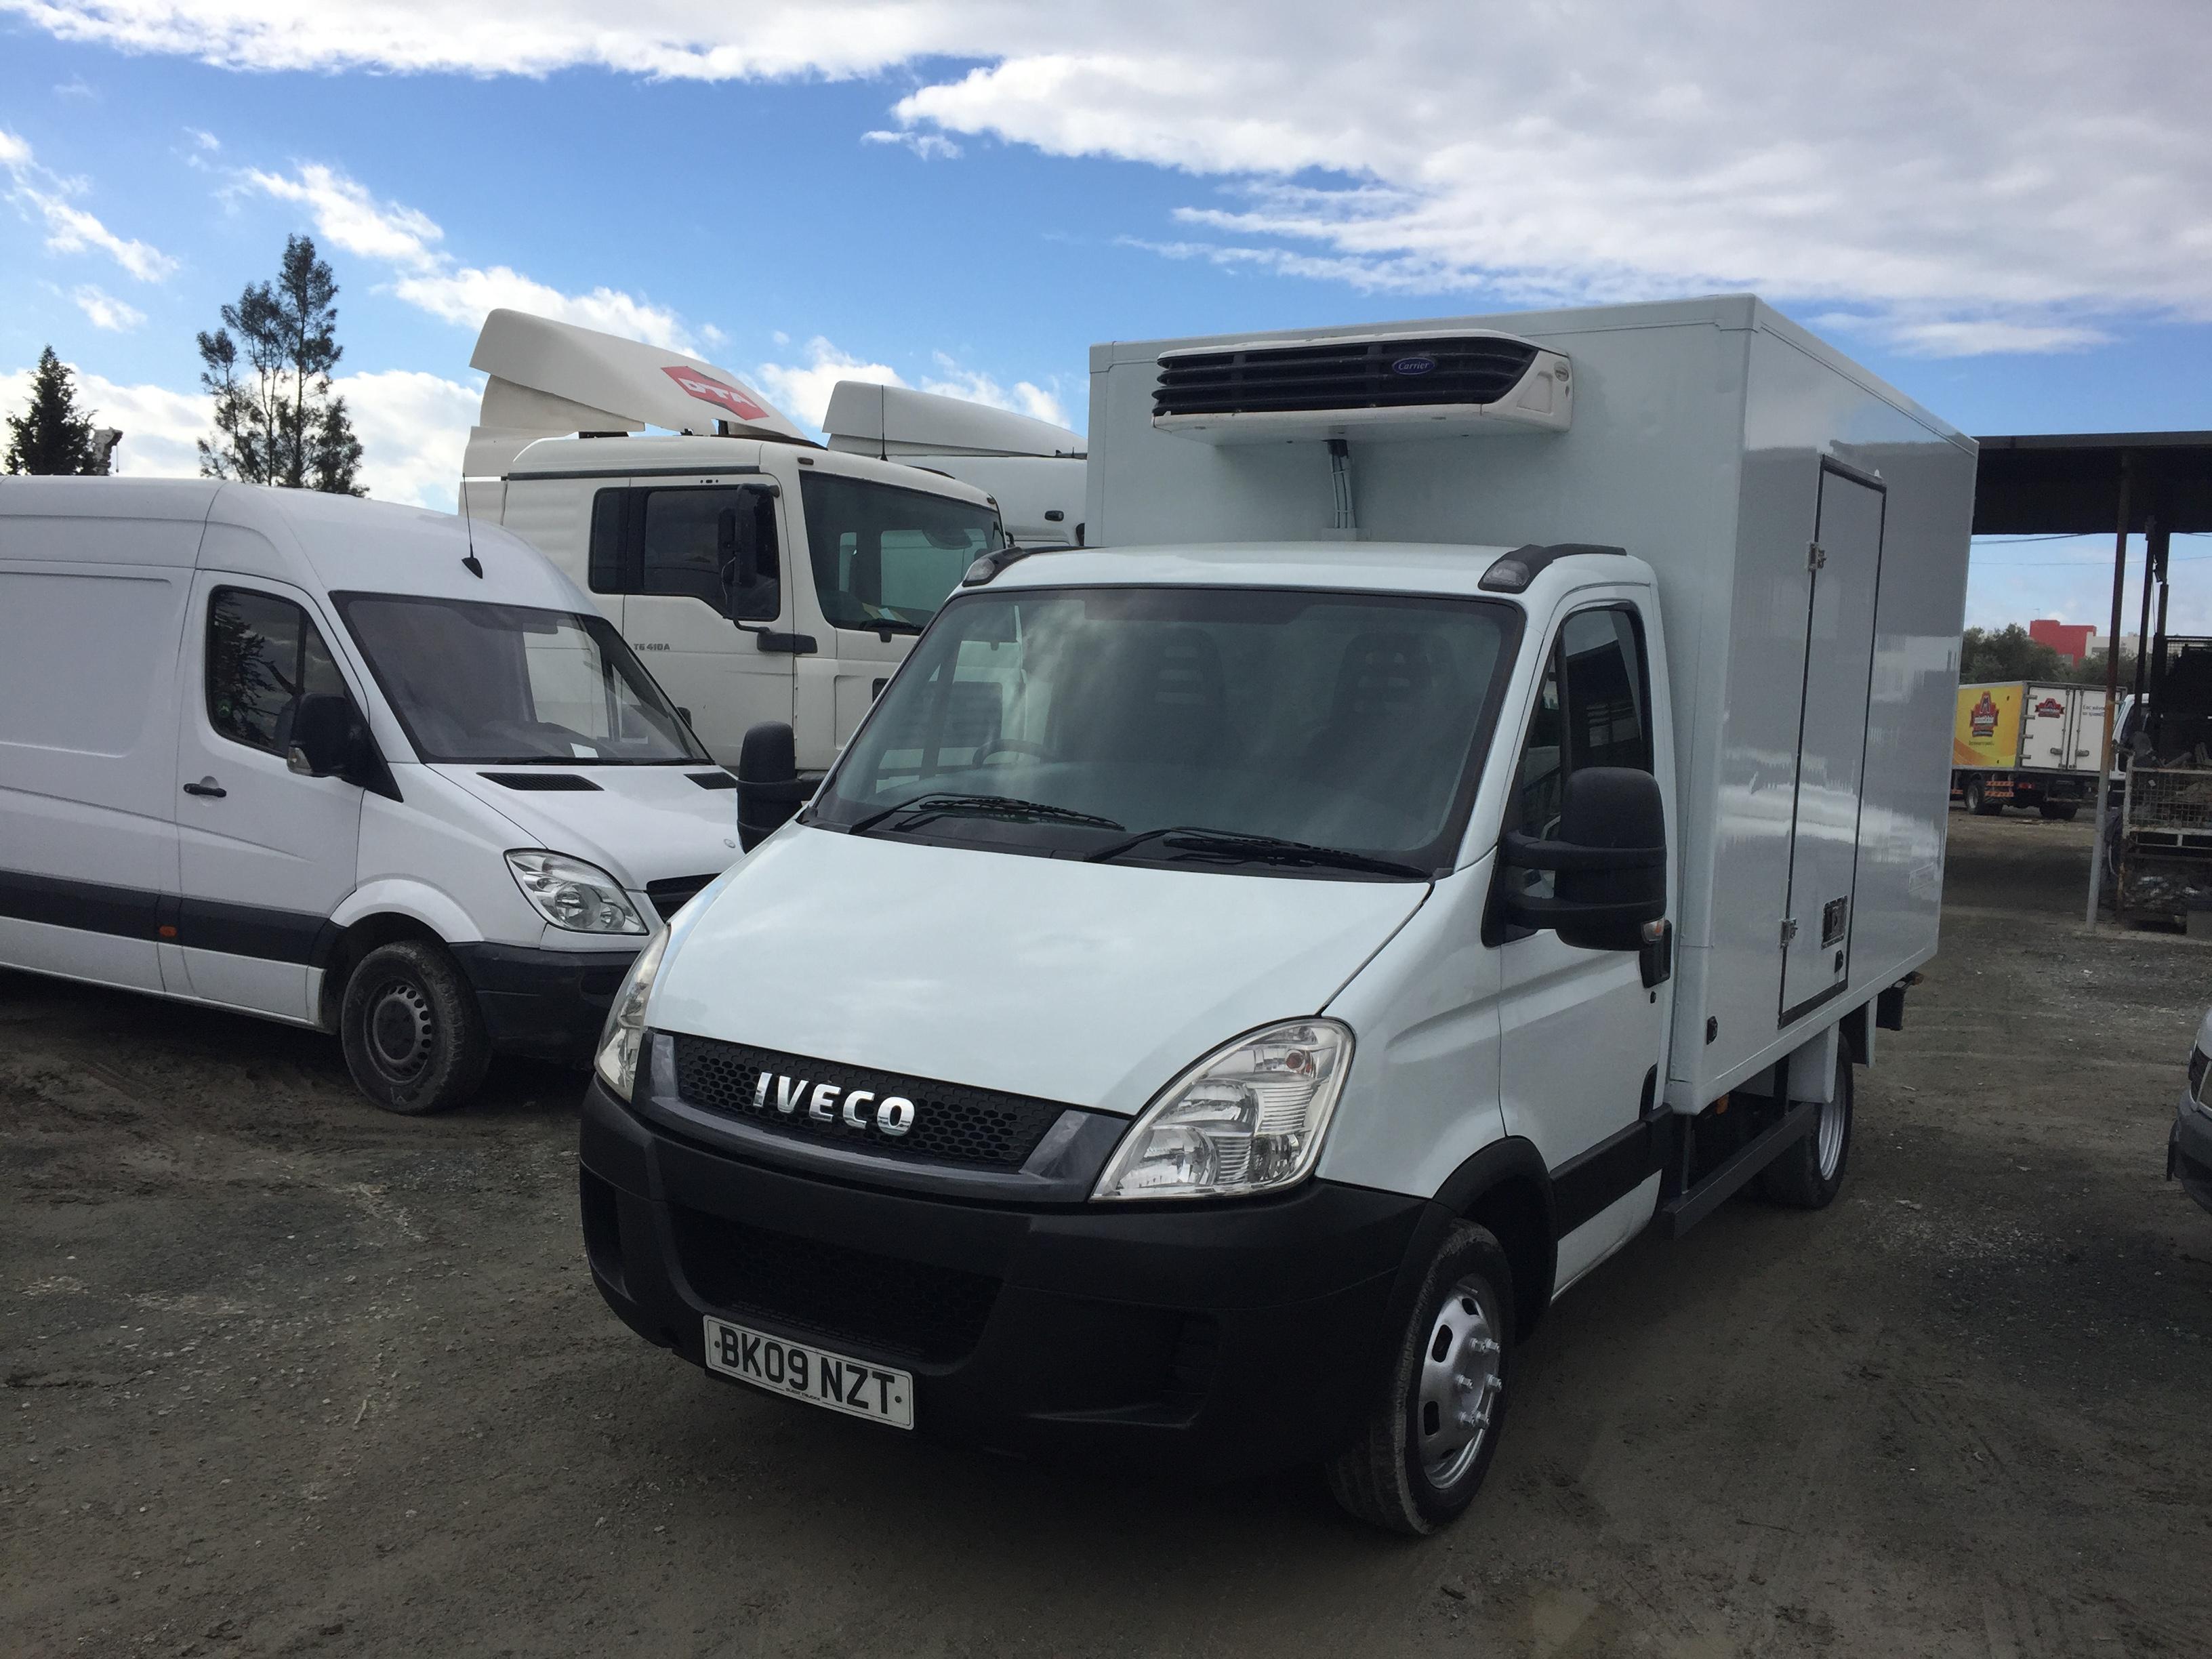 Bk09nzt Pavlos Zenonos General Motors Used Vans